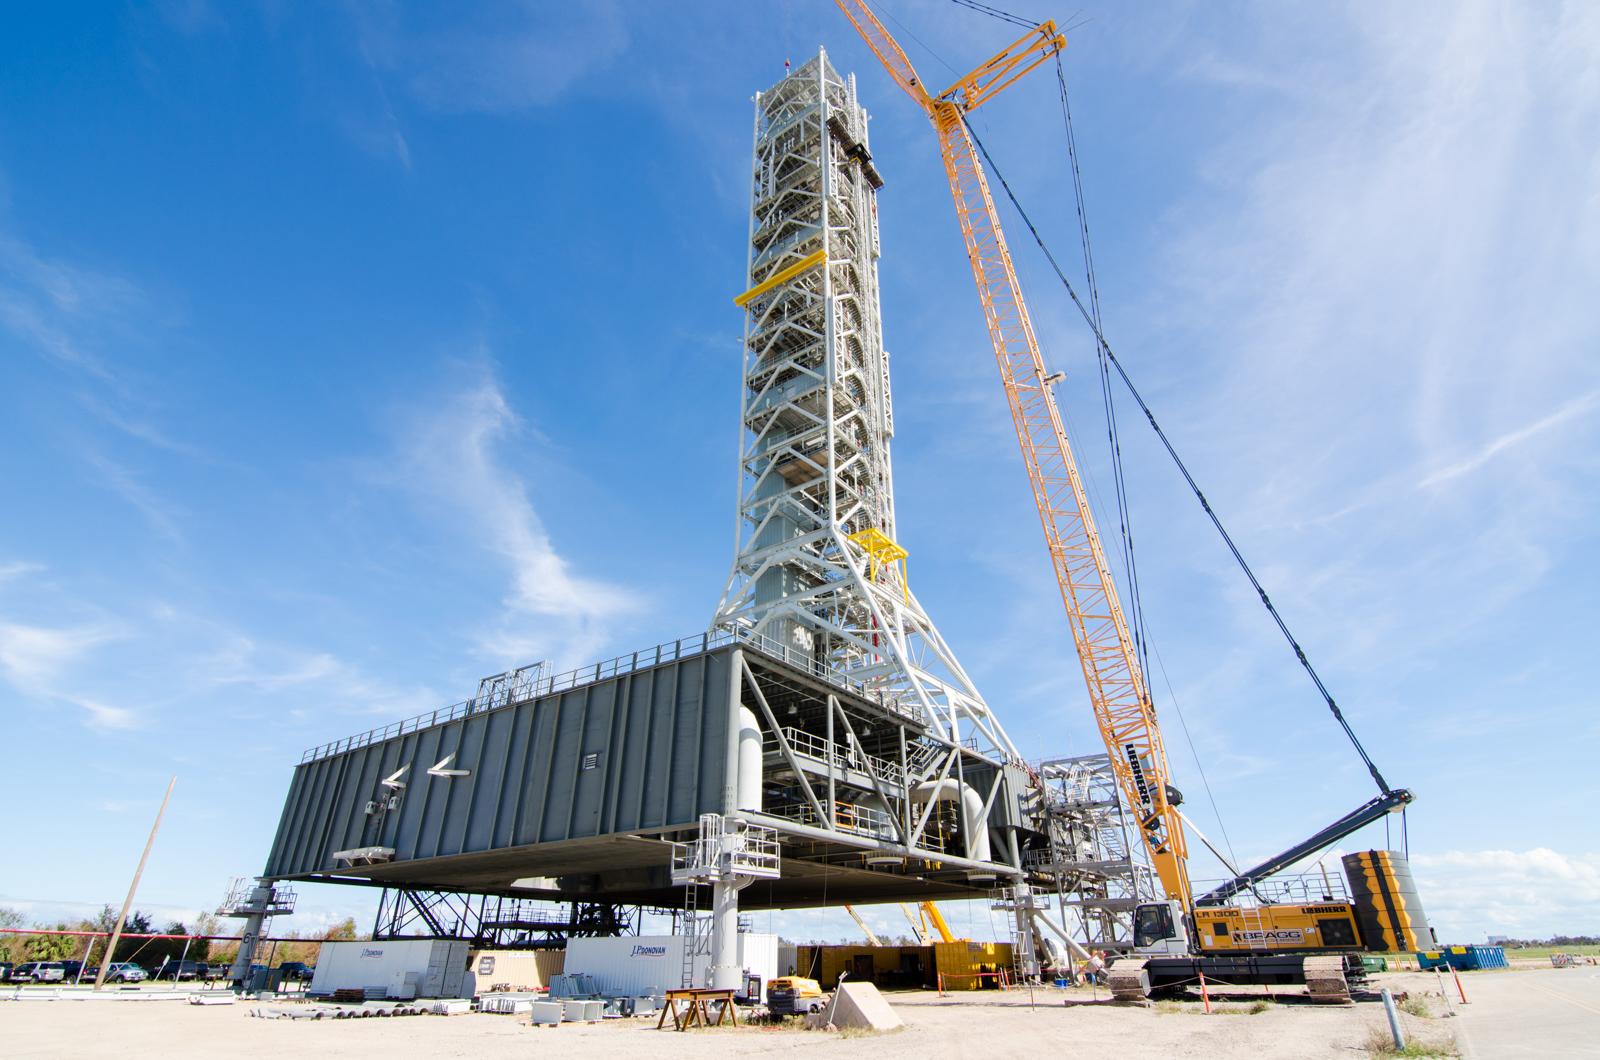 GSDO Mobile Launcher Ground Support Equipment Installation